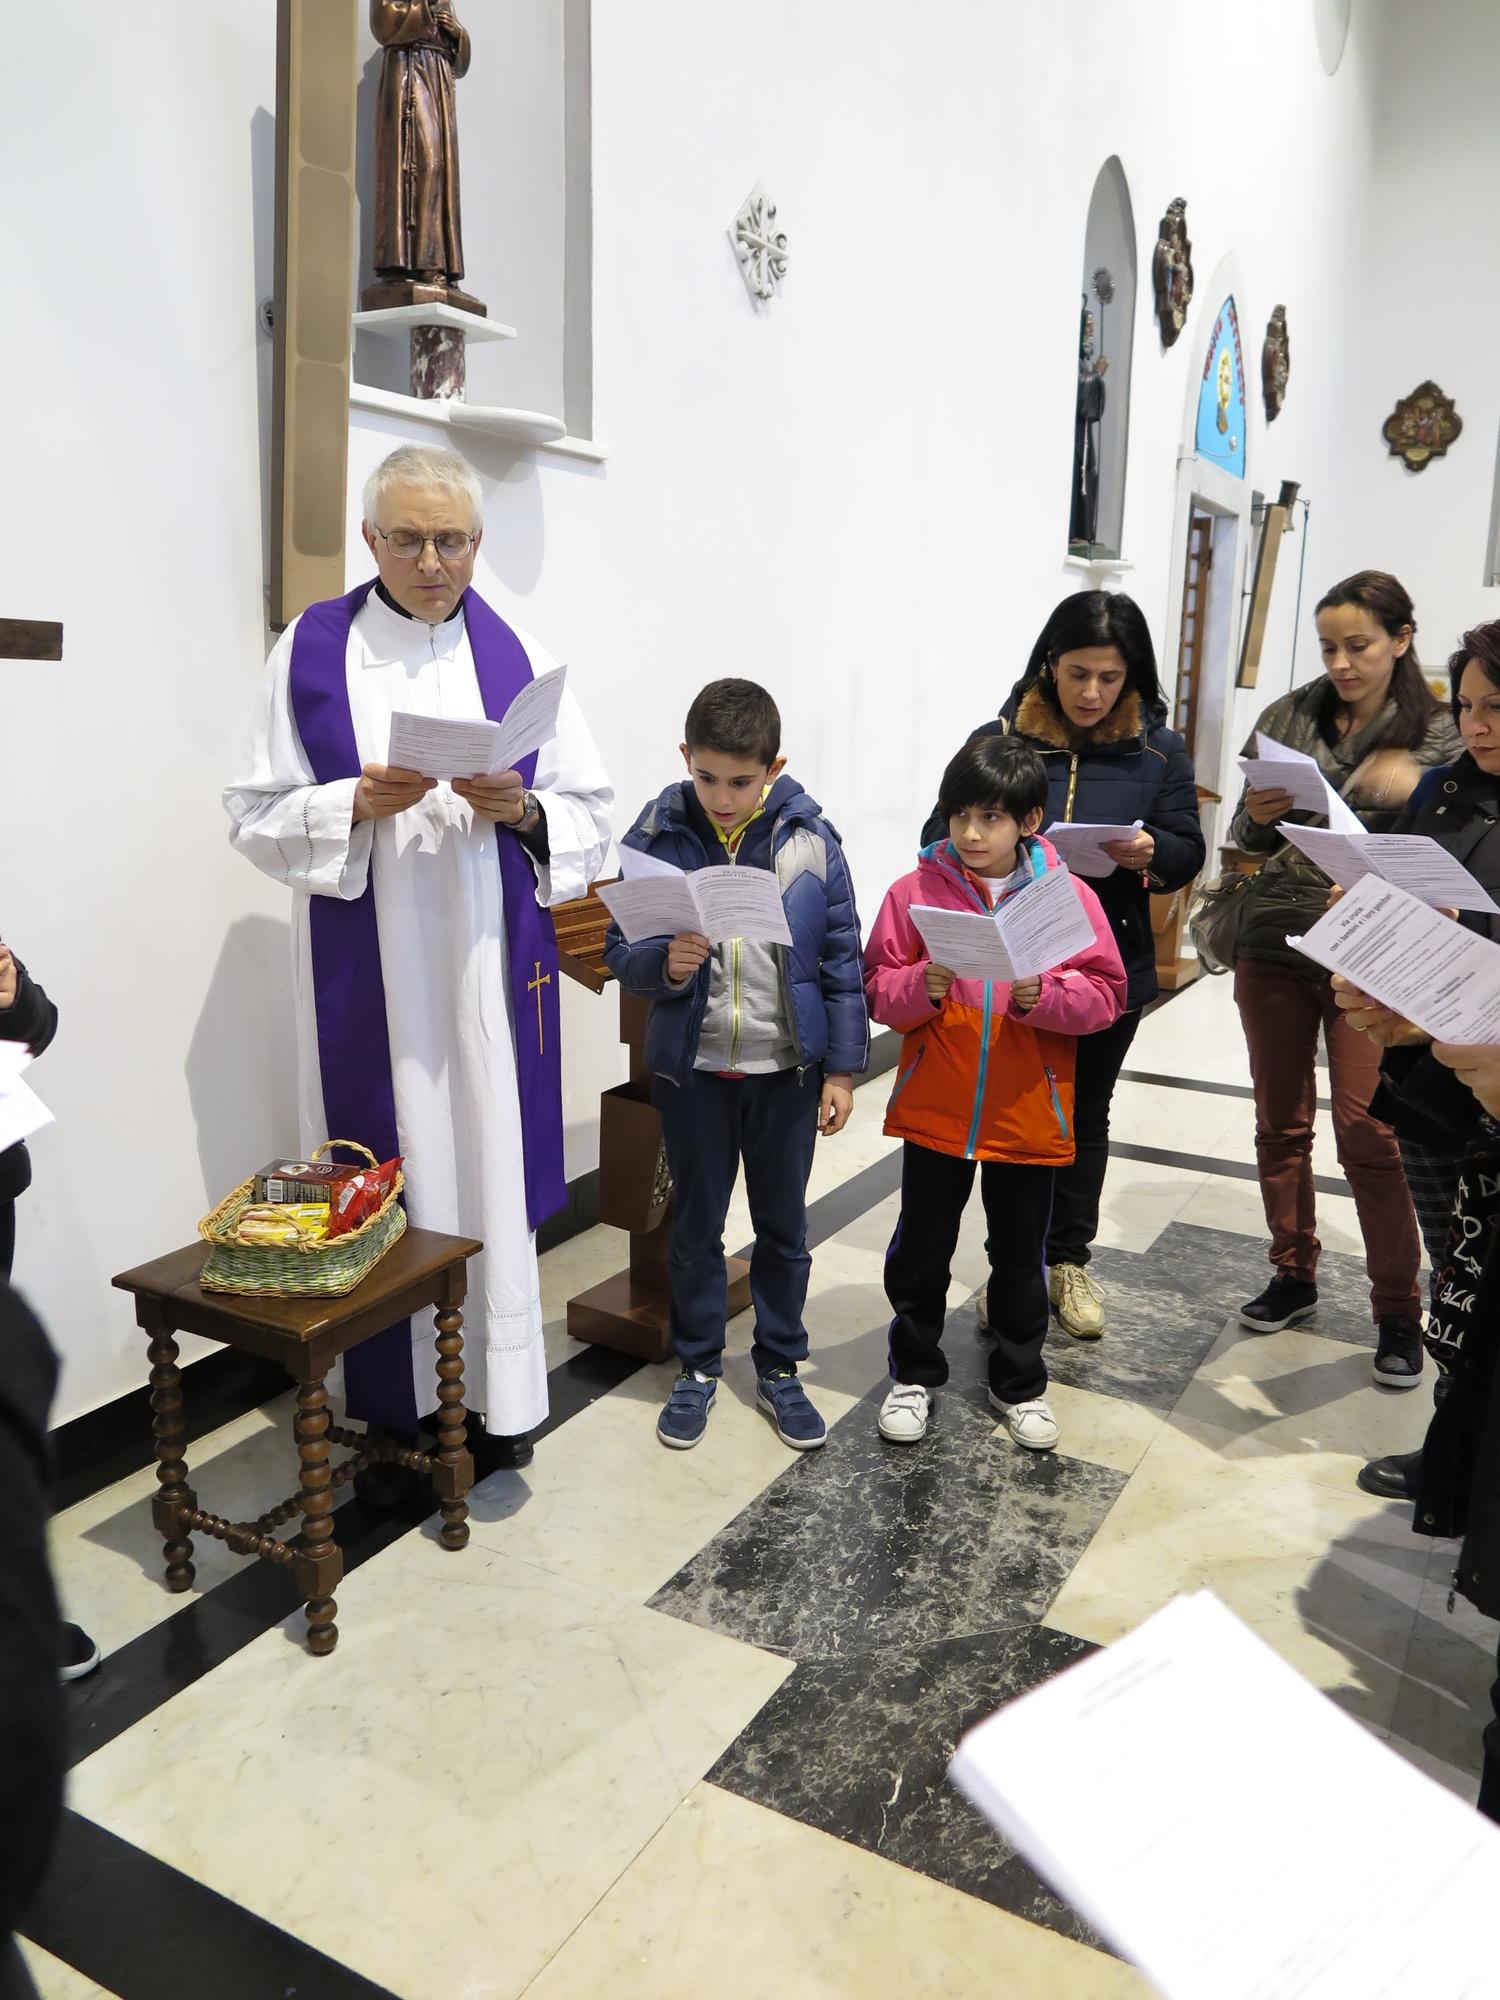 via-crucis-catechismo-2016-03-15-17-07-56